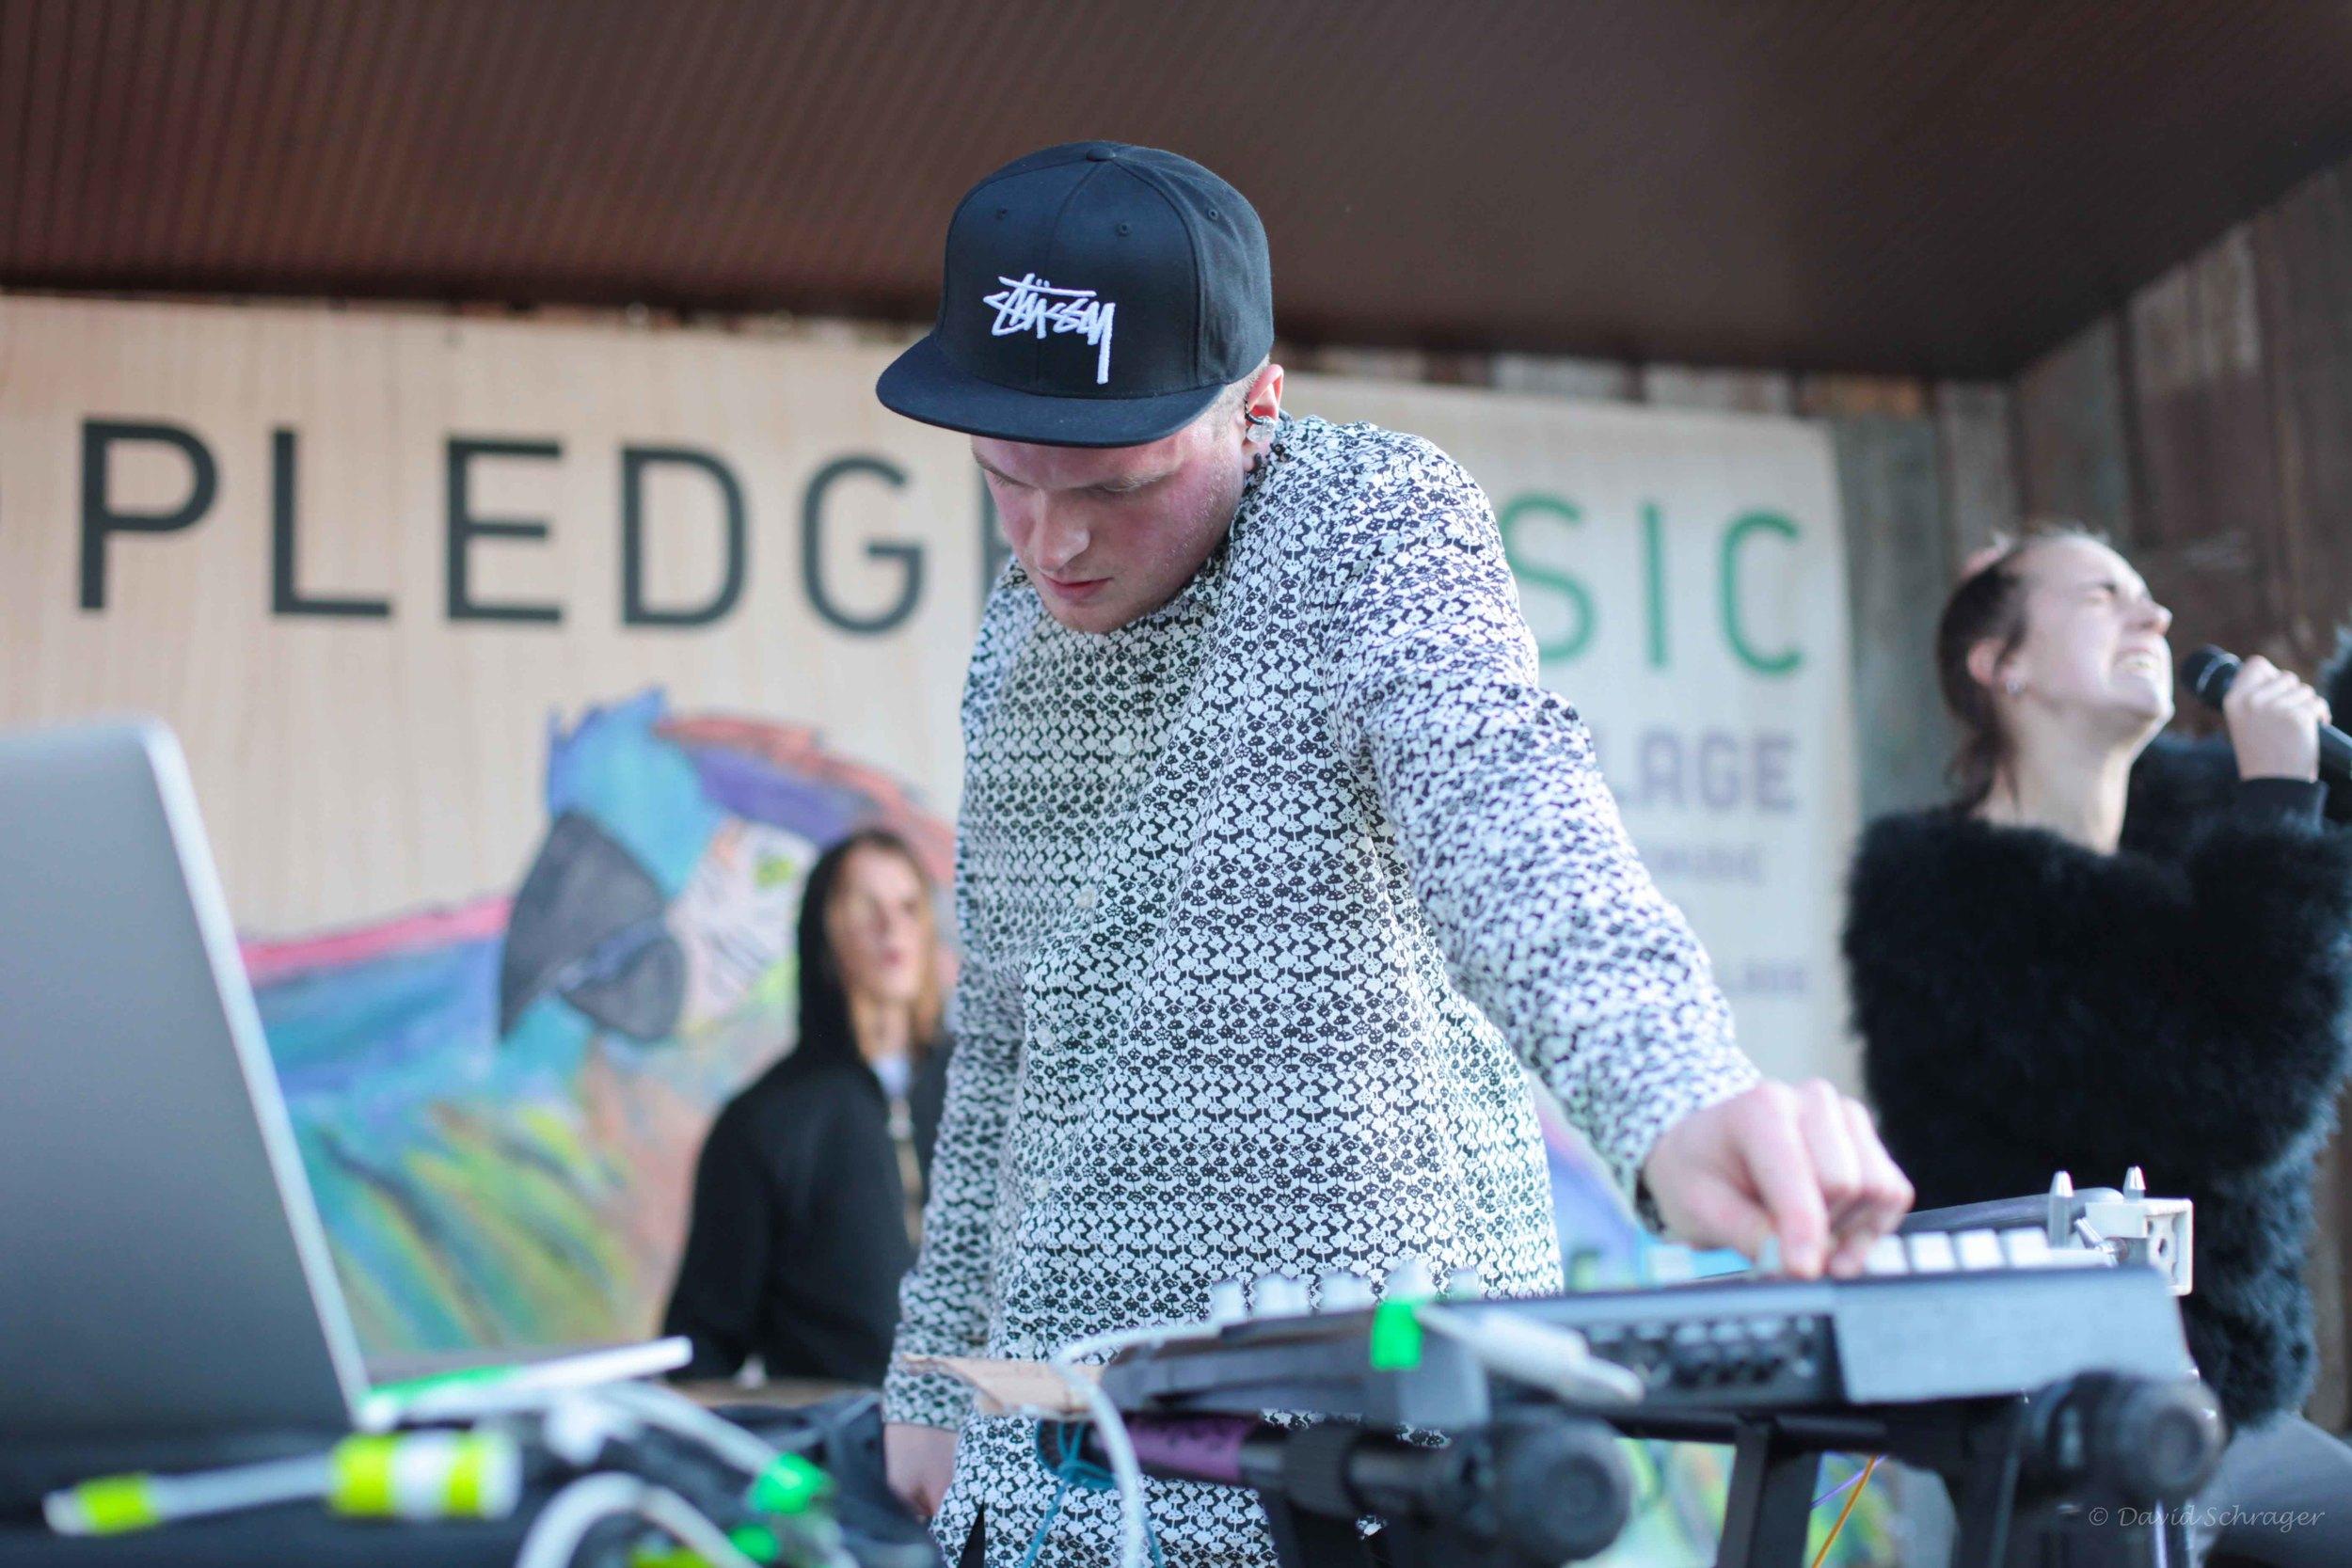 MØ @ The Blackheart on Rainey// Pledge Pavilion